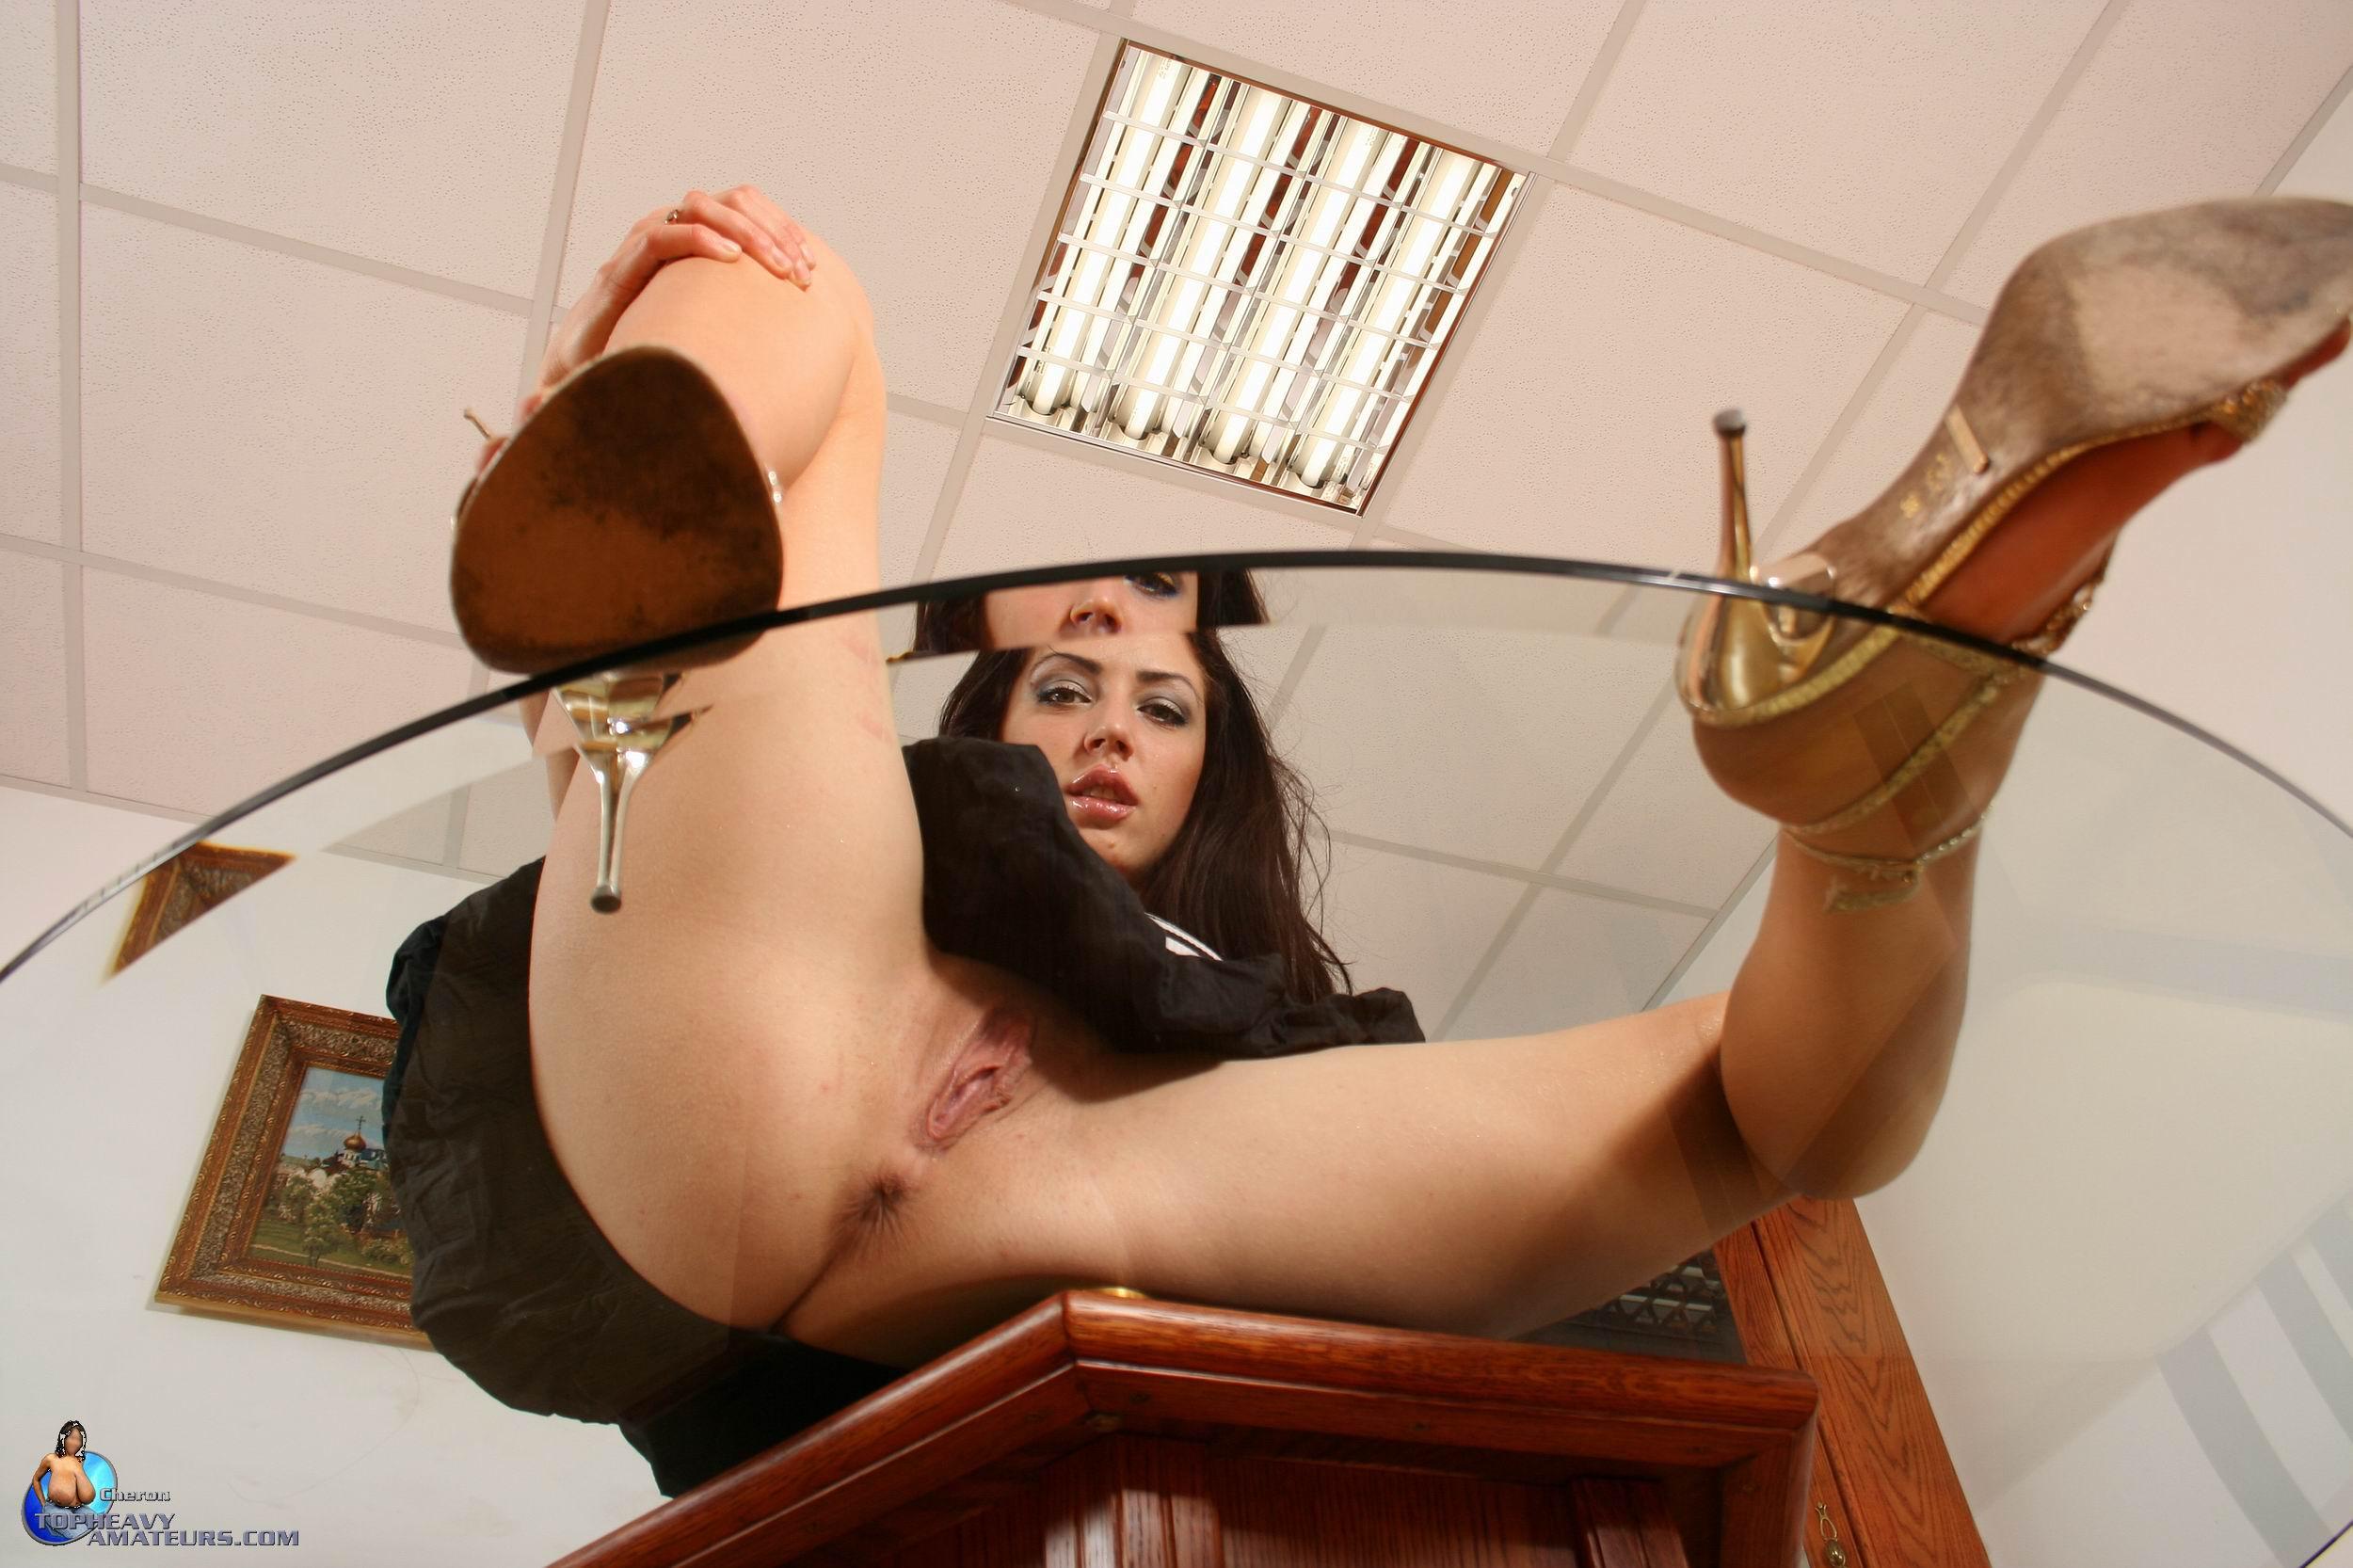 My Boob Site Big Tits Blog » Blog Archive » Big Tits on Glass ...